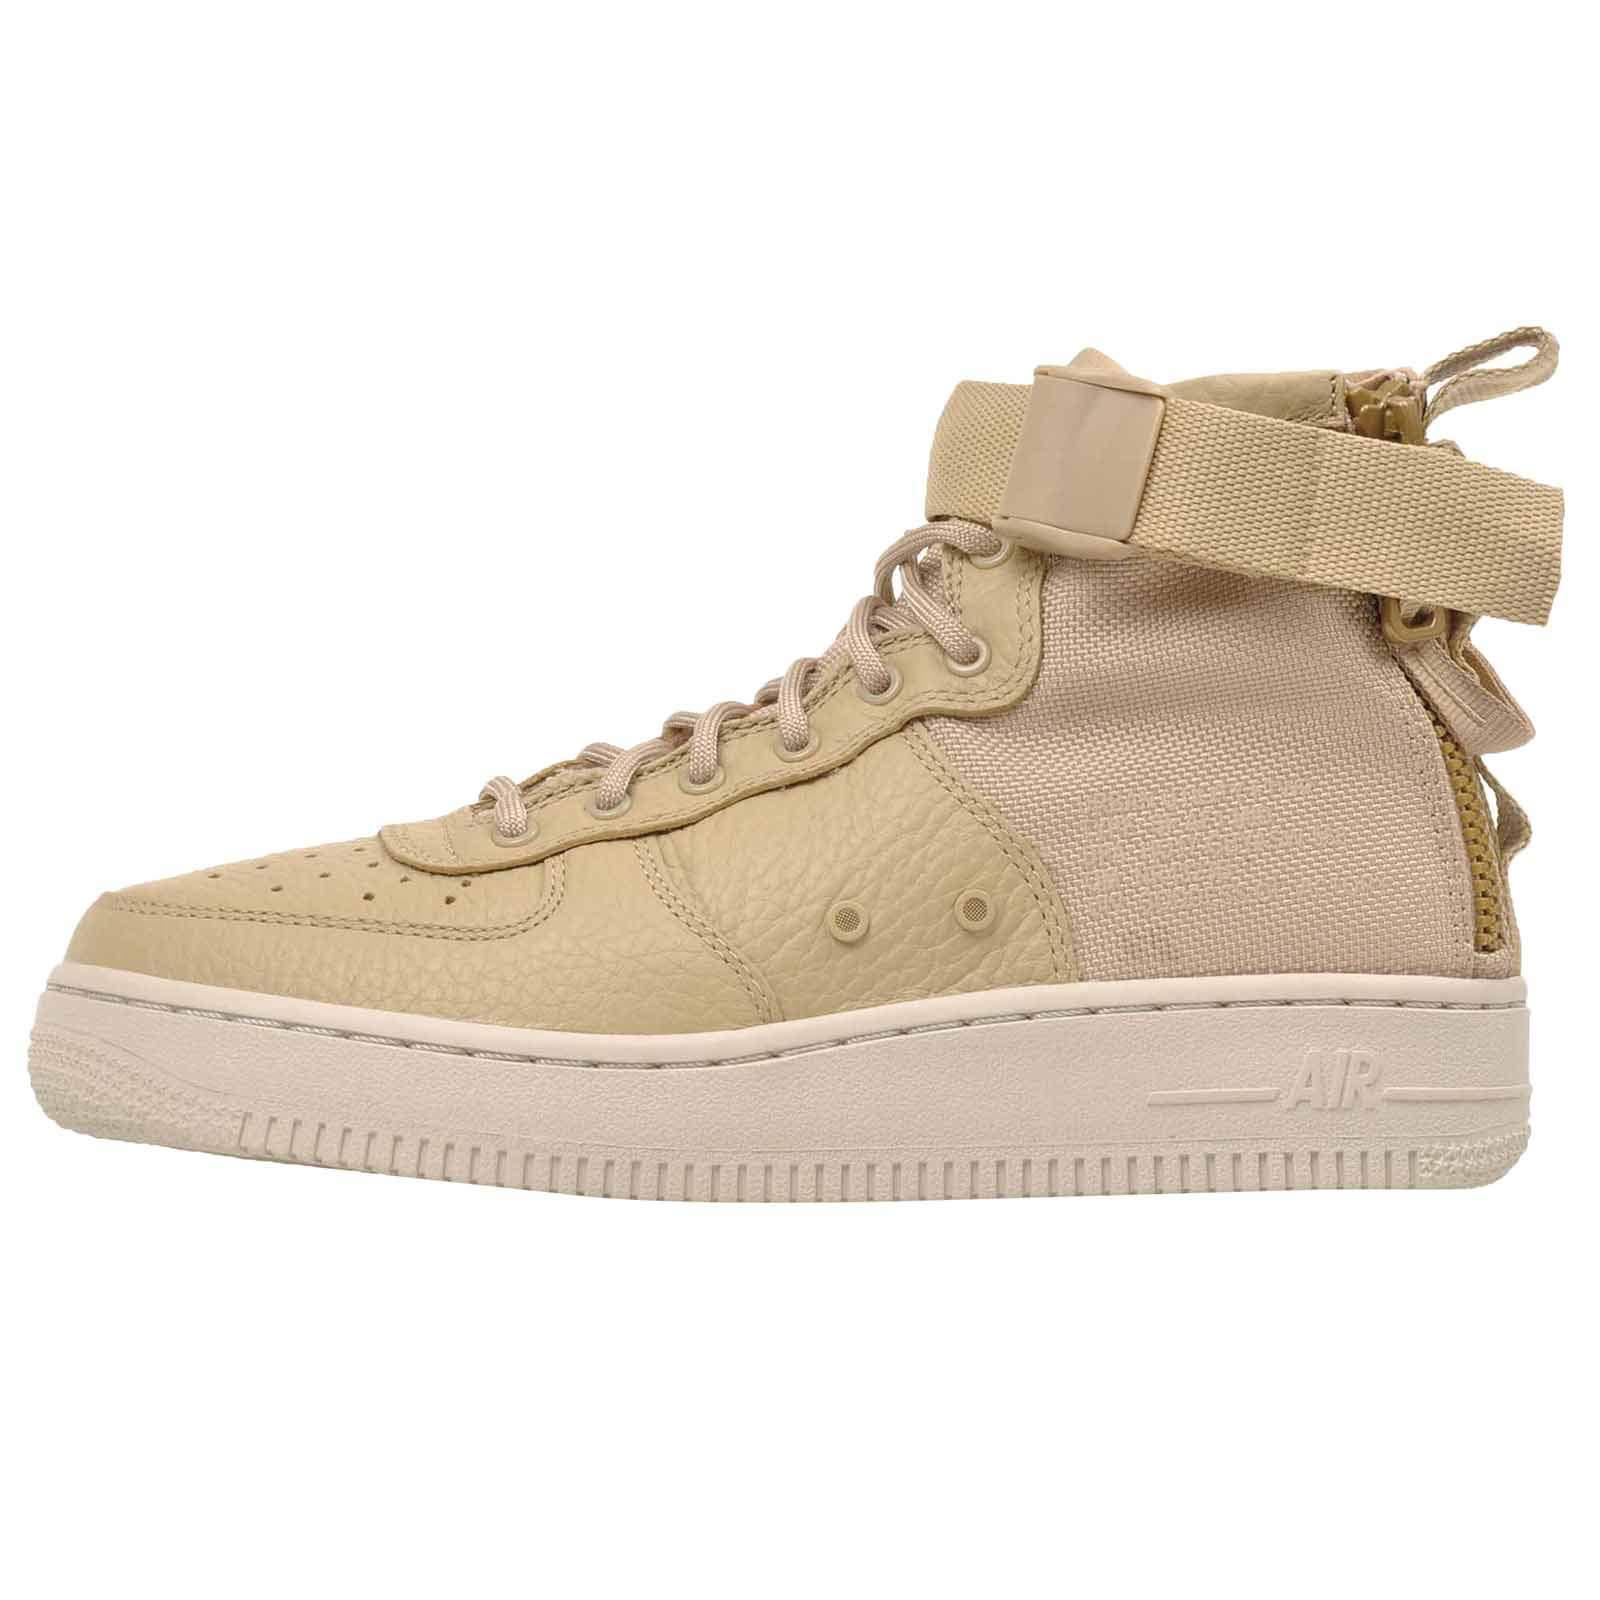 1a0732aae6 Galleon - Nike SF Air Force 1 Mid G.S Youth Big Kids Mushroom/Light Bone  AJ0424-200 (5)